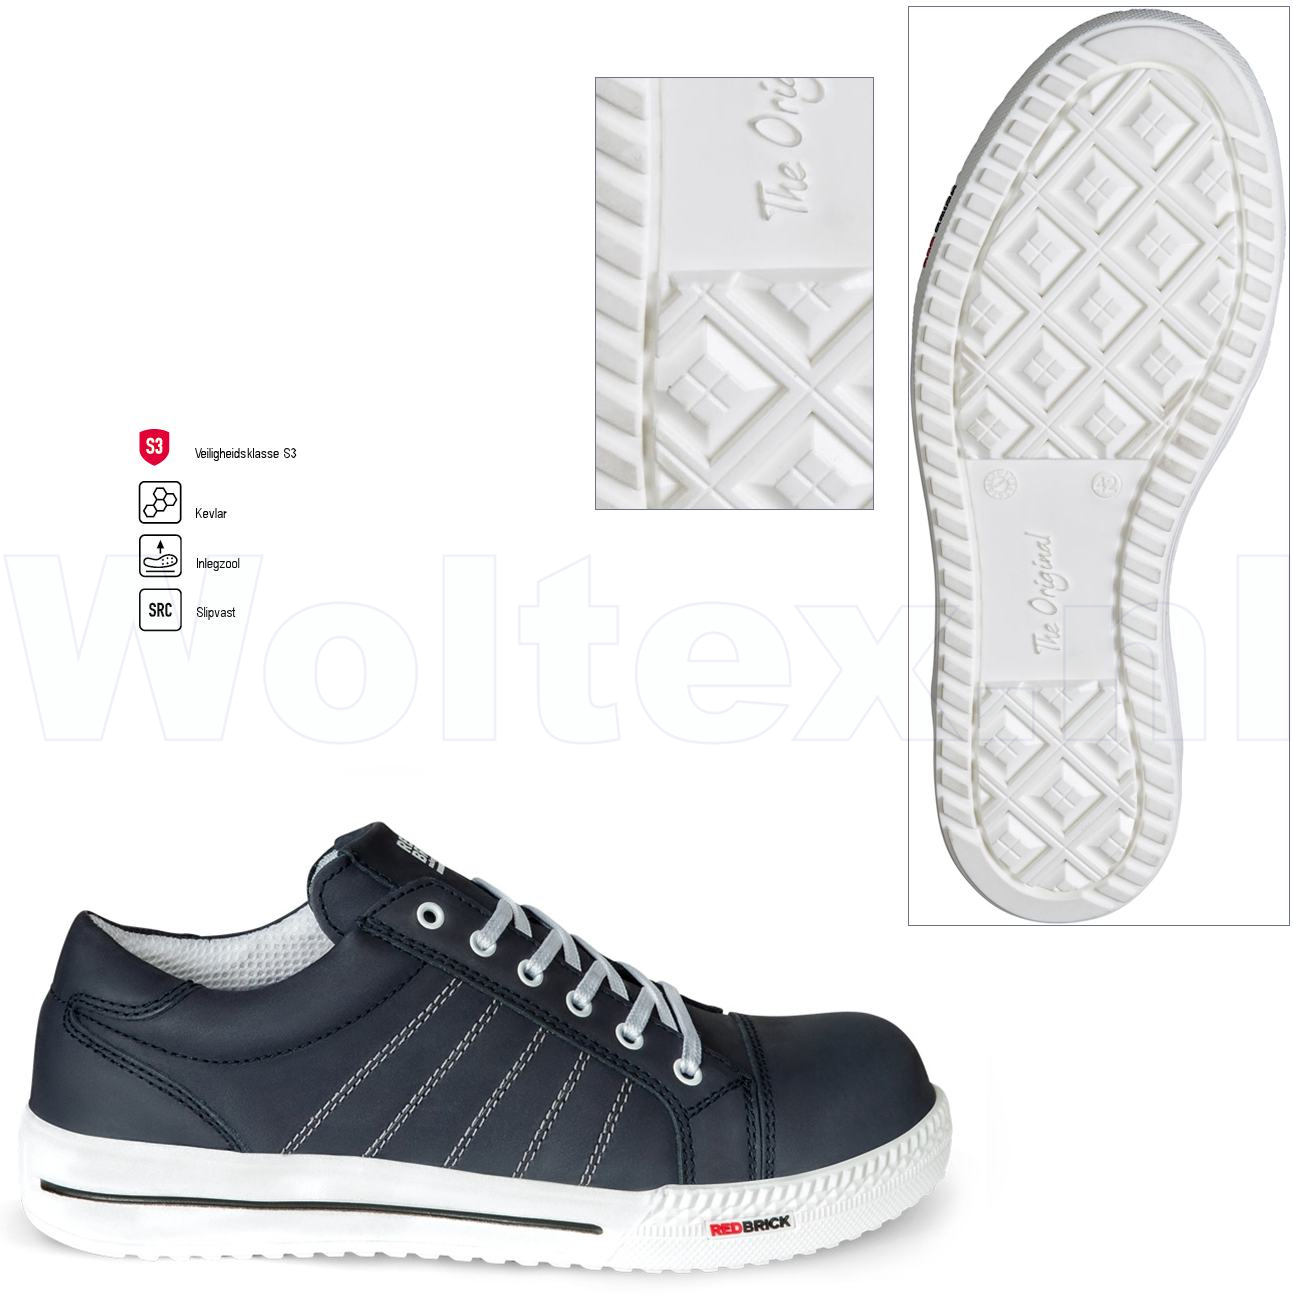 Modieuze Werkschoenen.Redbrick Safety Sneakers Originals S3 Werkschoenen Saphire Donkerblauw